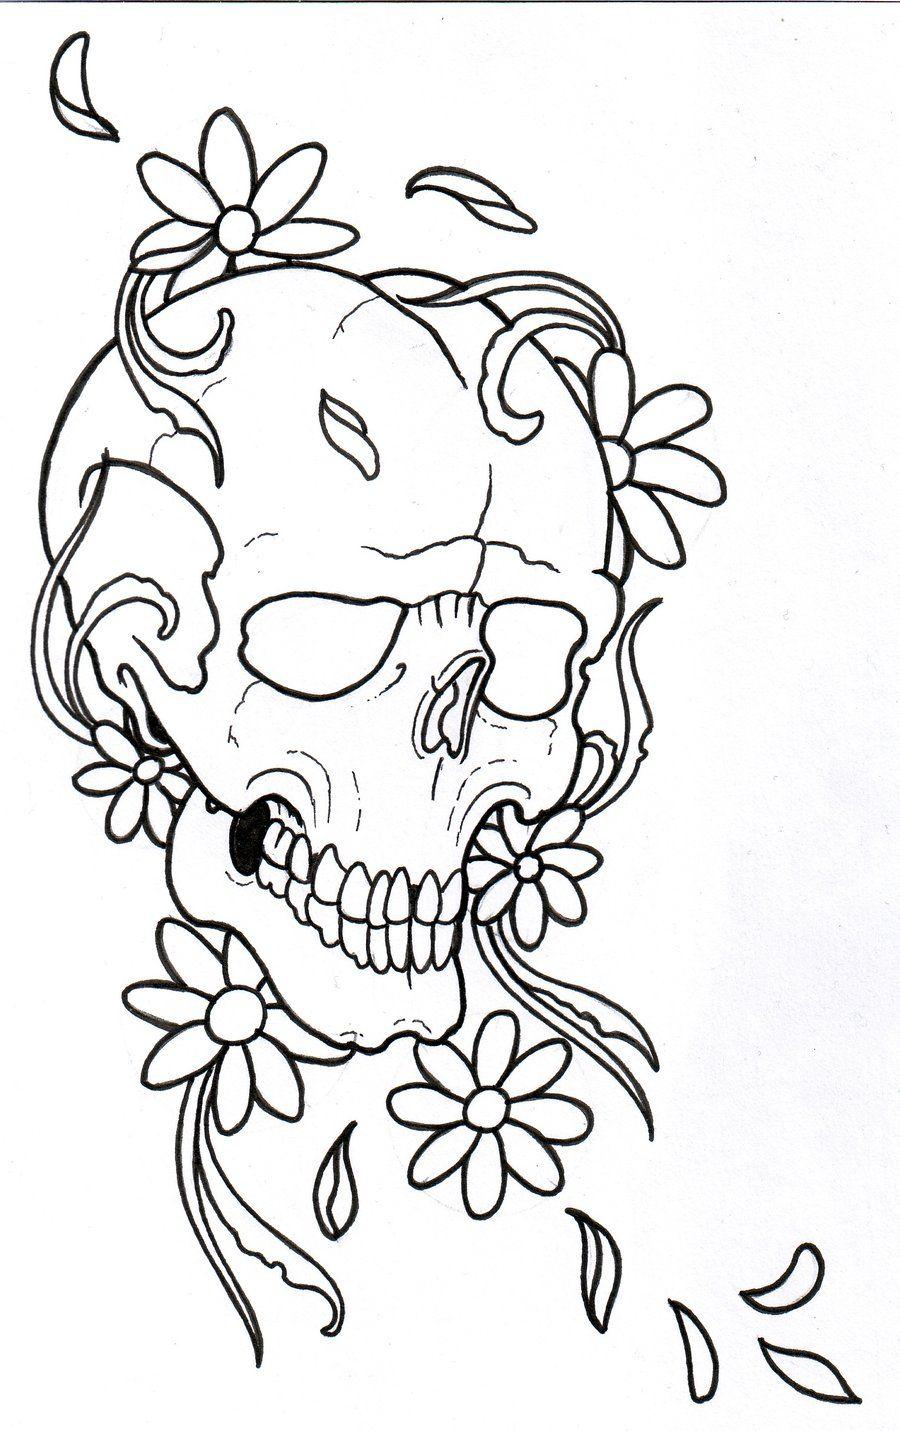 Tattoo Flower Outline Flower outline drawing Outline